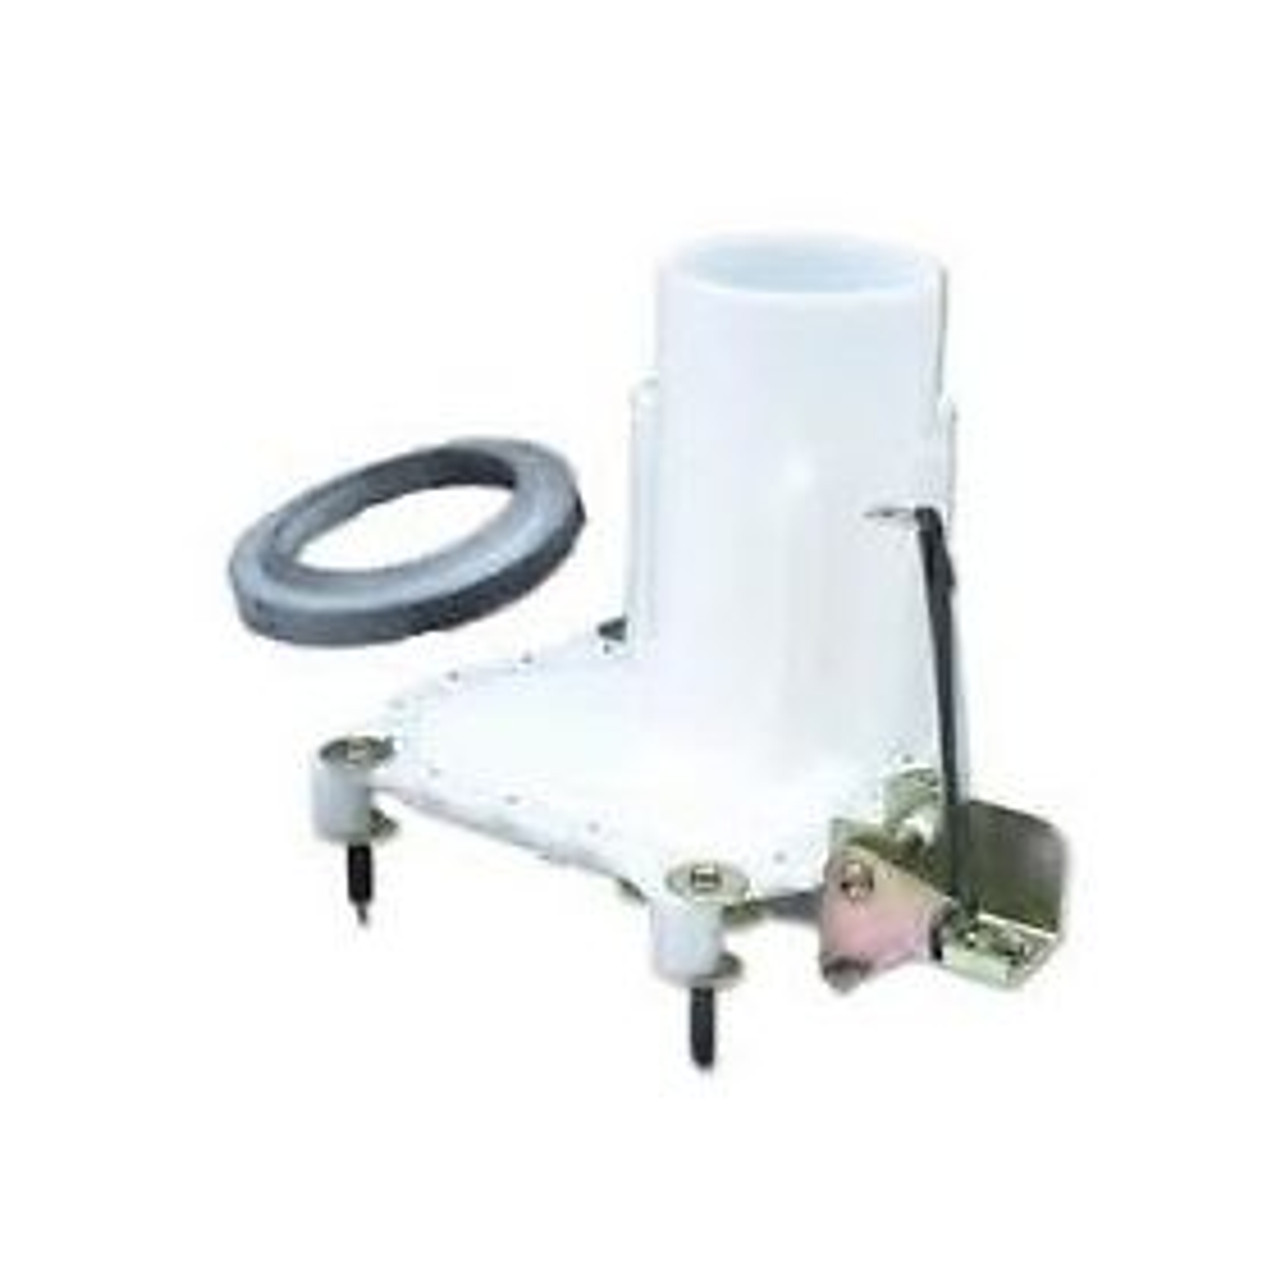 Thetford 33187 White Toilet Lower Mechanism